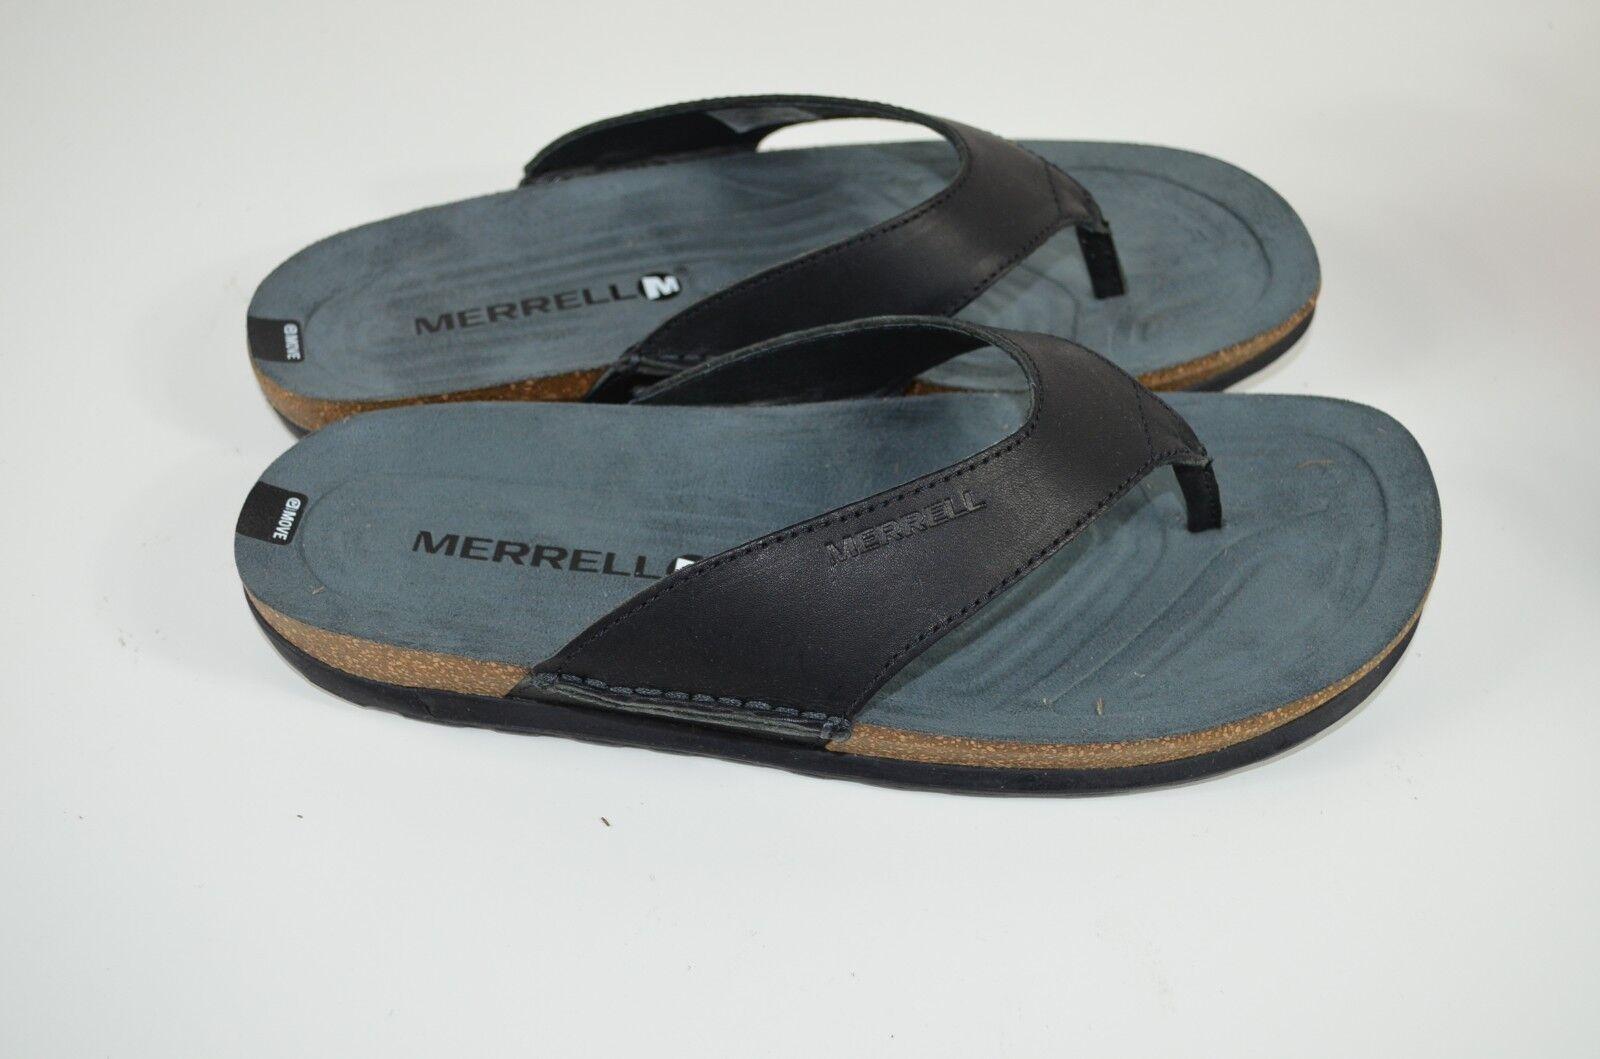 NIB New Merrell Downtown Flip Flop Sz 8 Black Leather